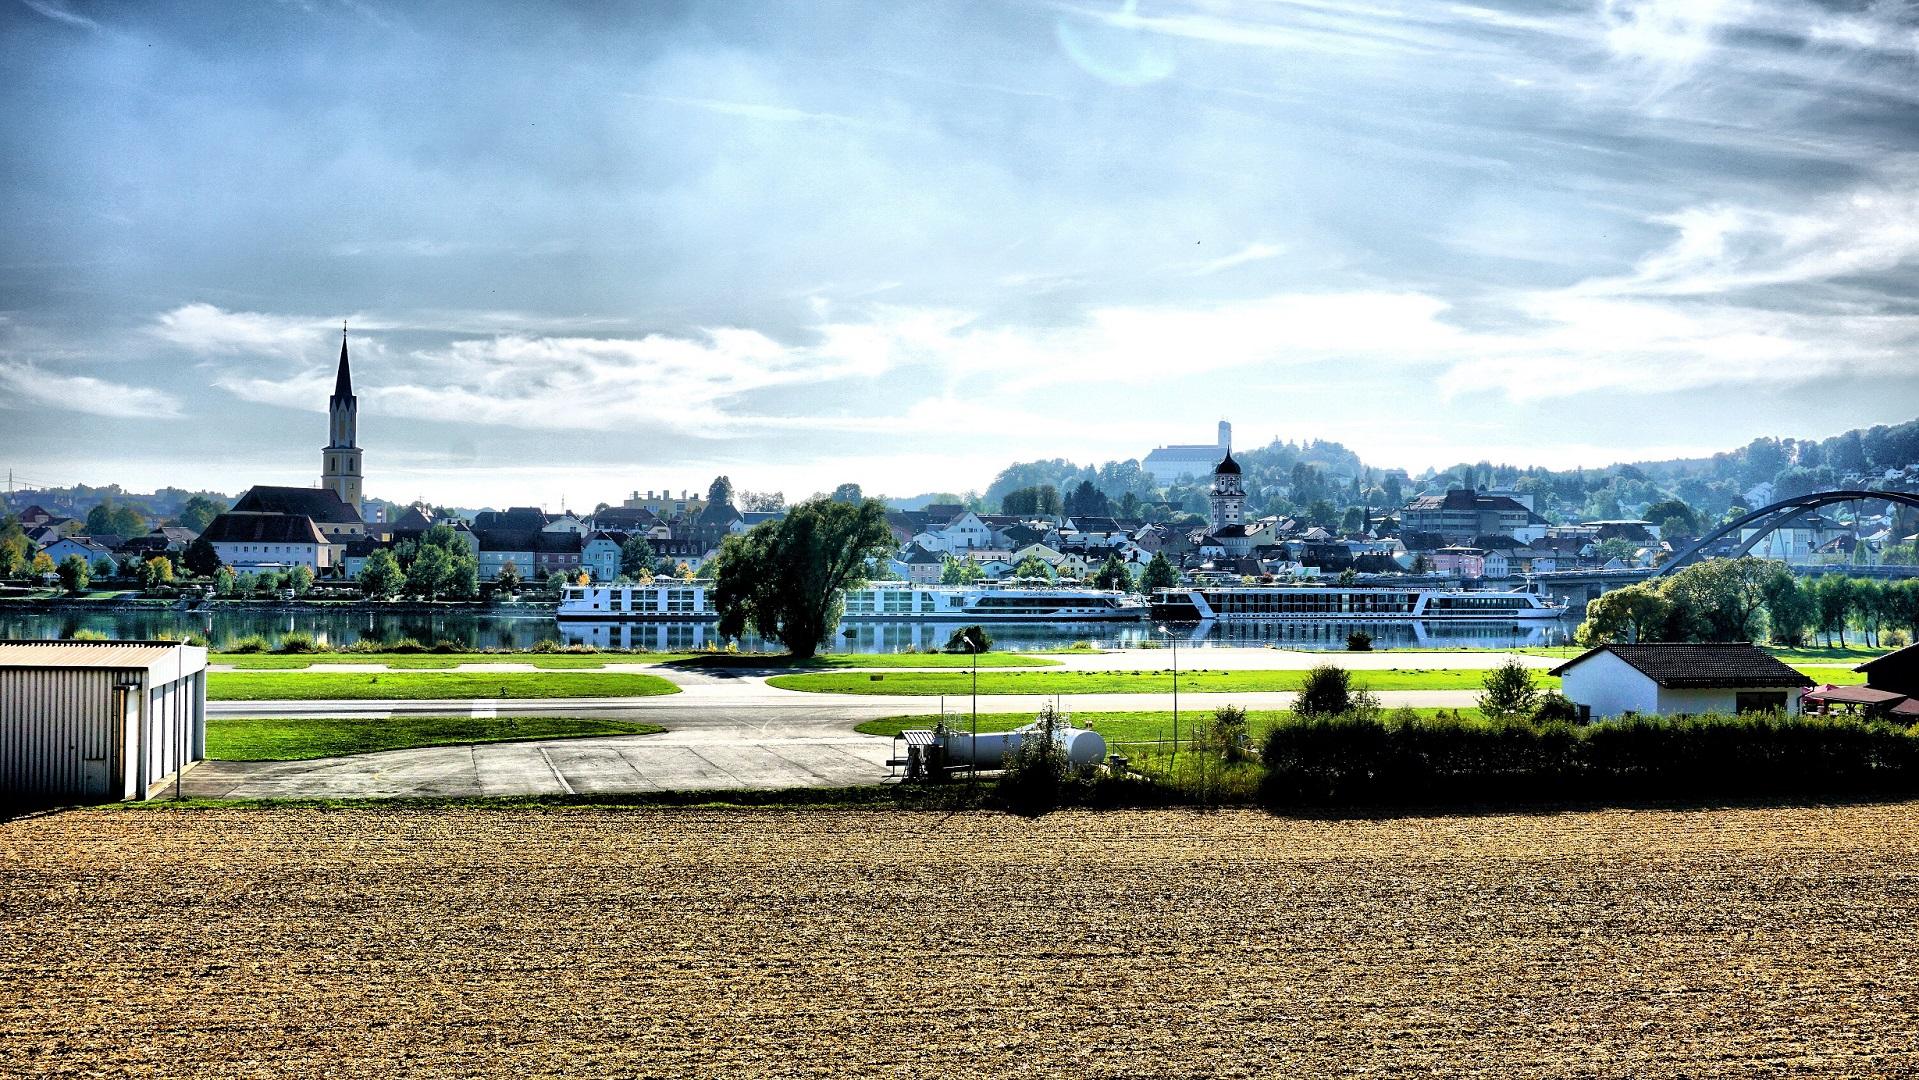 Vilshofen, Pro-Vilshofen, Sonntag